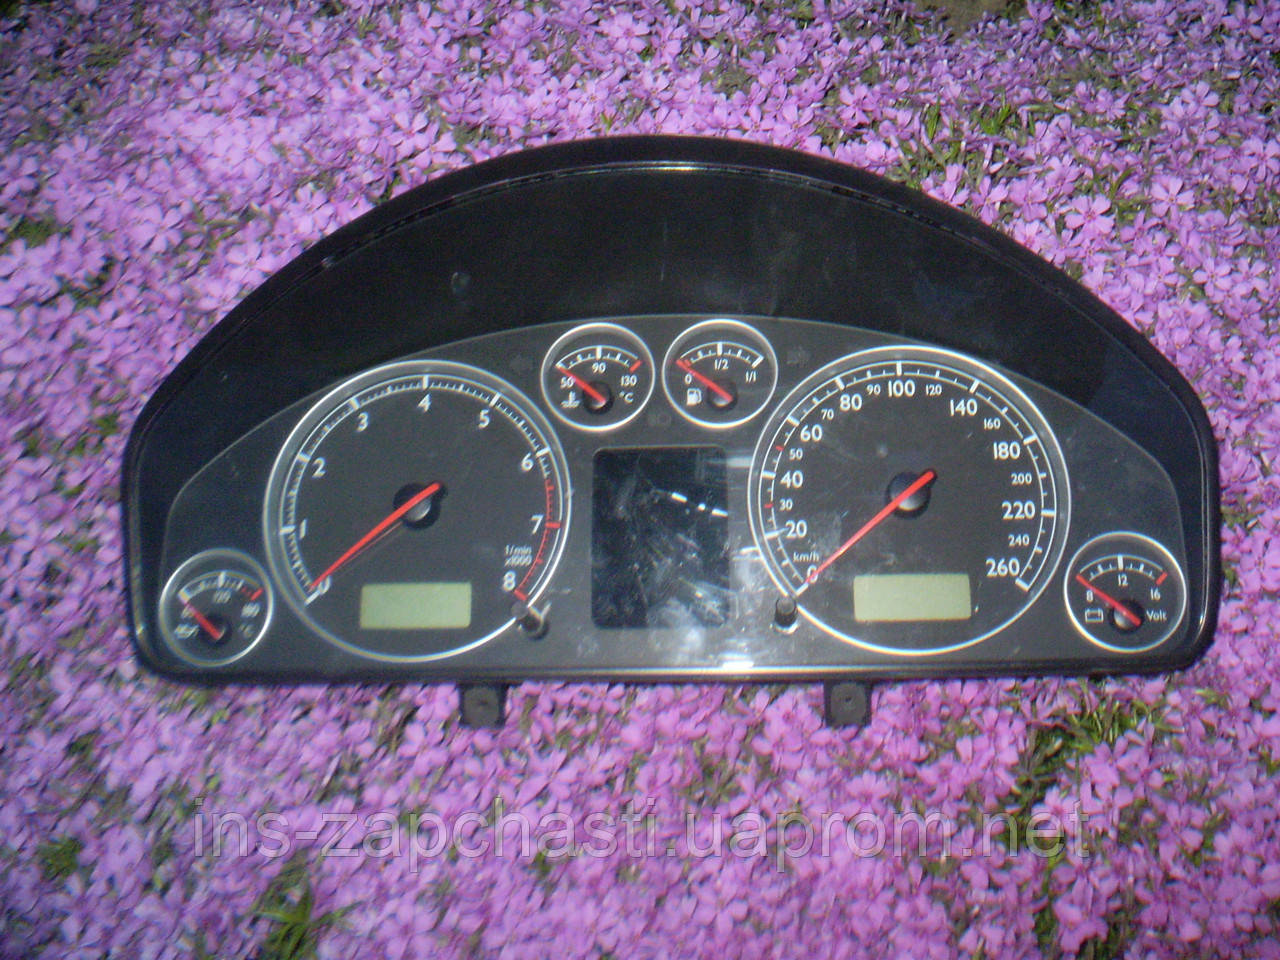 Панель приборная VW SHARAN 7m3 920 840 FORD GALAXY YM2110849AE AUDI SKODA SEAT ALHAMBRA 2.8 бенз.